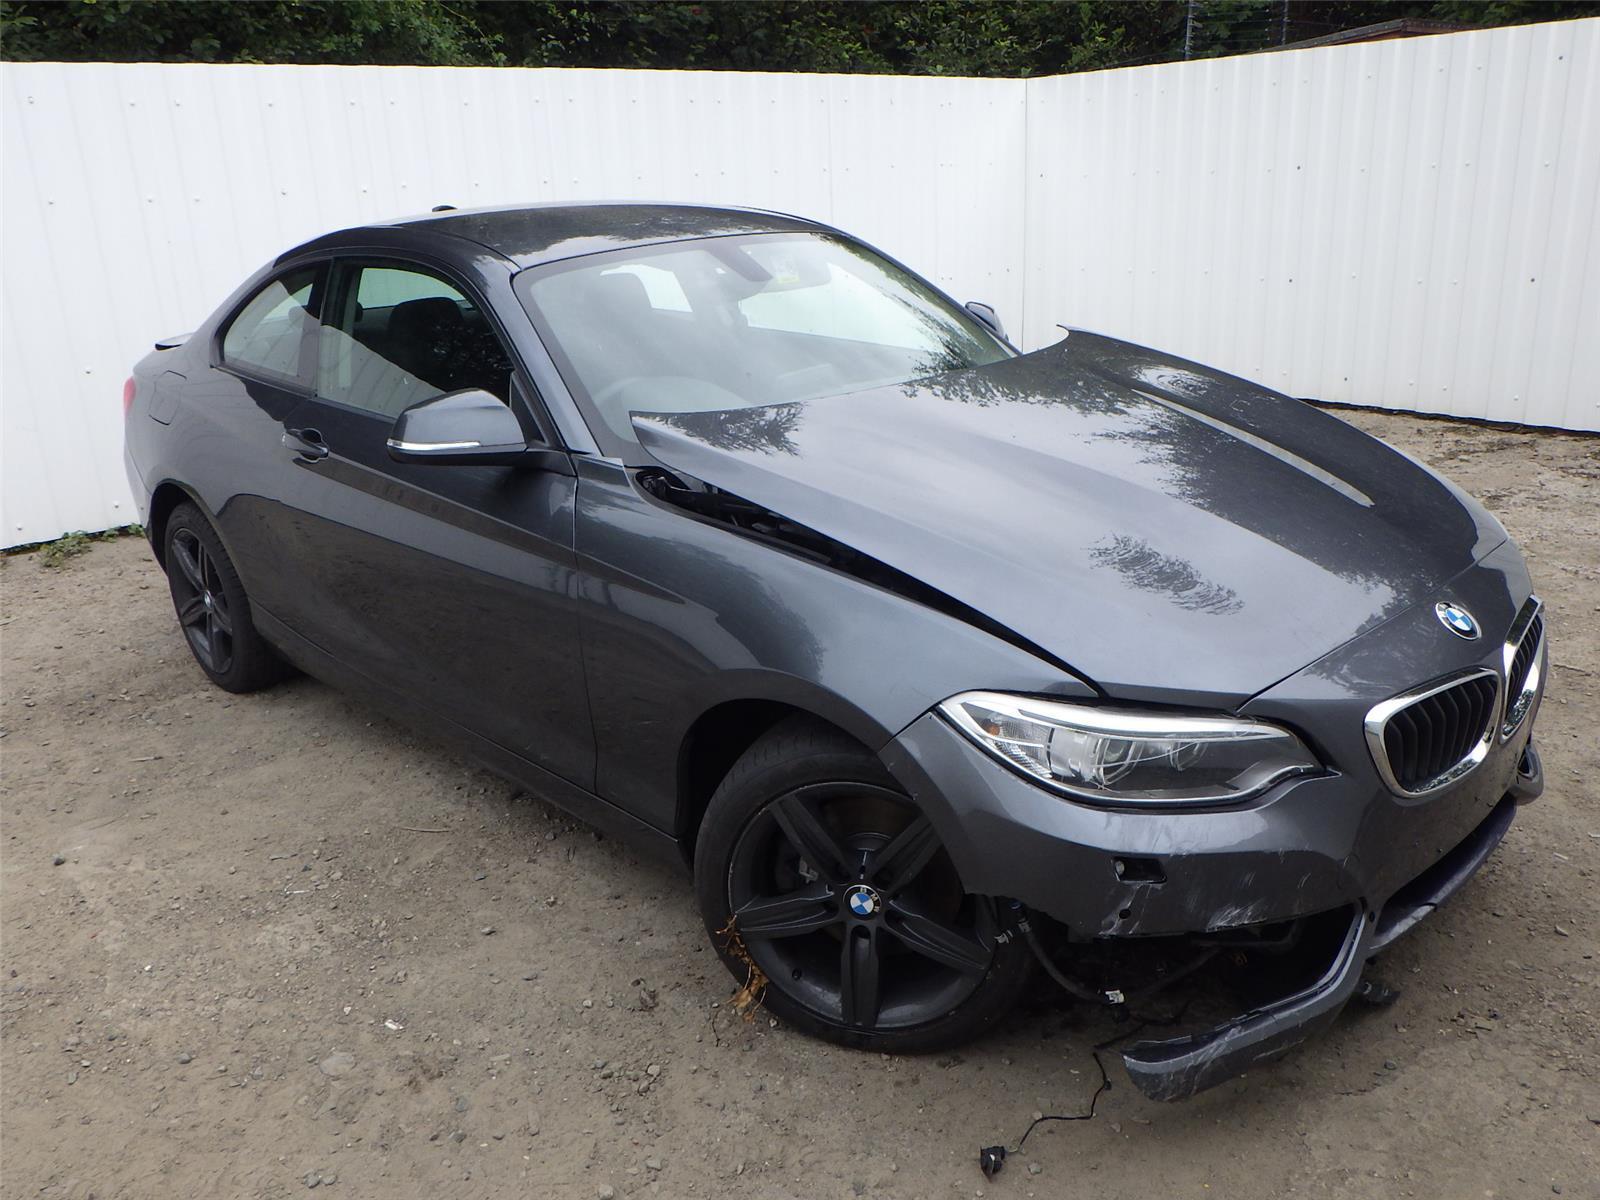 2014 BMW 2 SERIES 220D SPORT 1995cc TURBO DIESEL MANUAL 2 DOOR COUPE